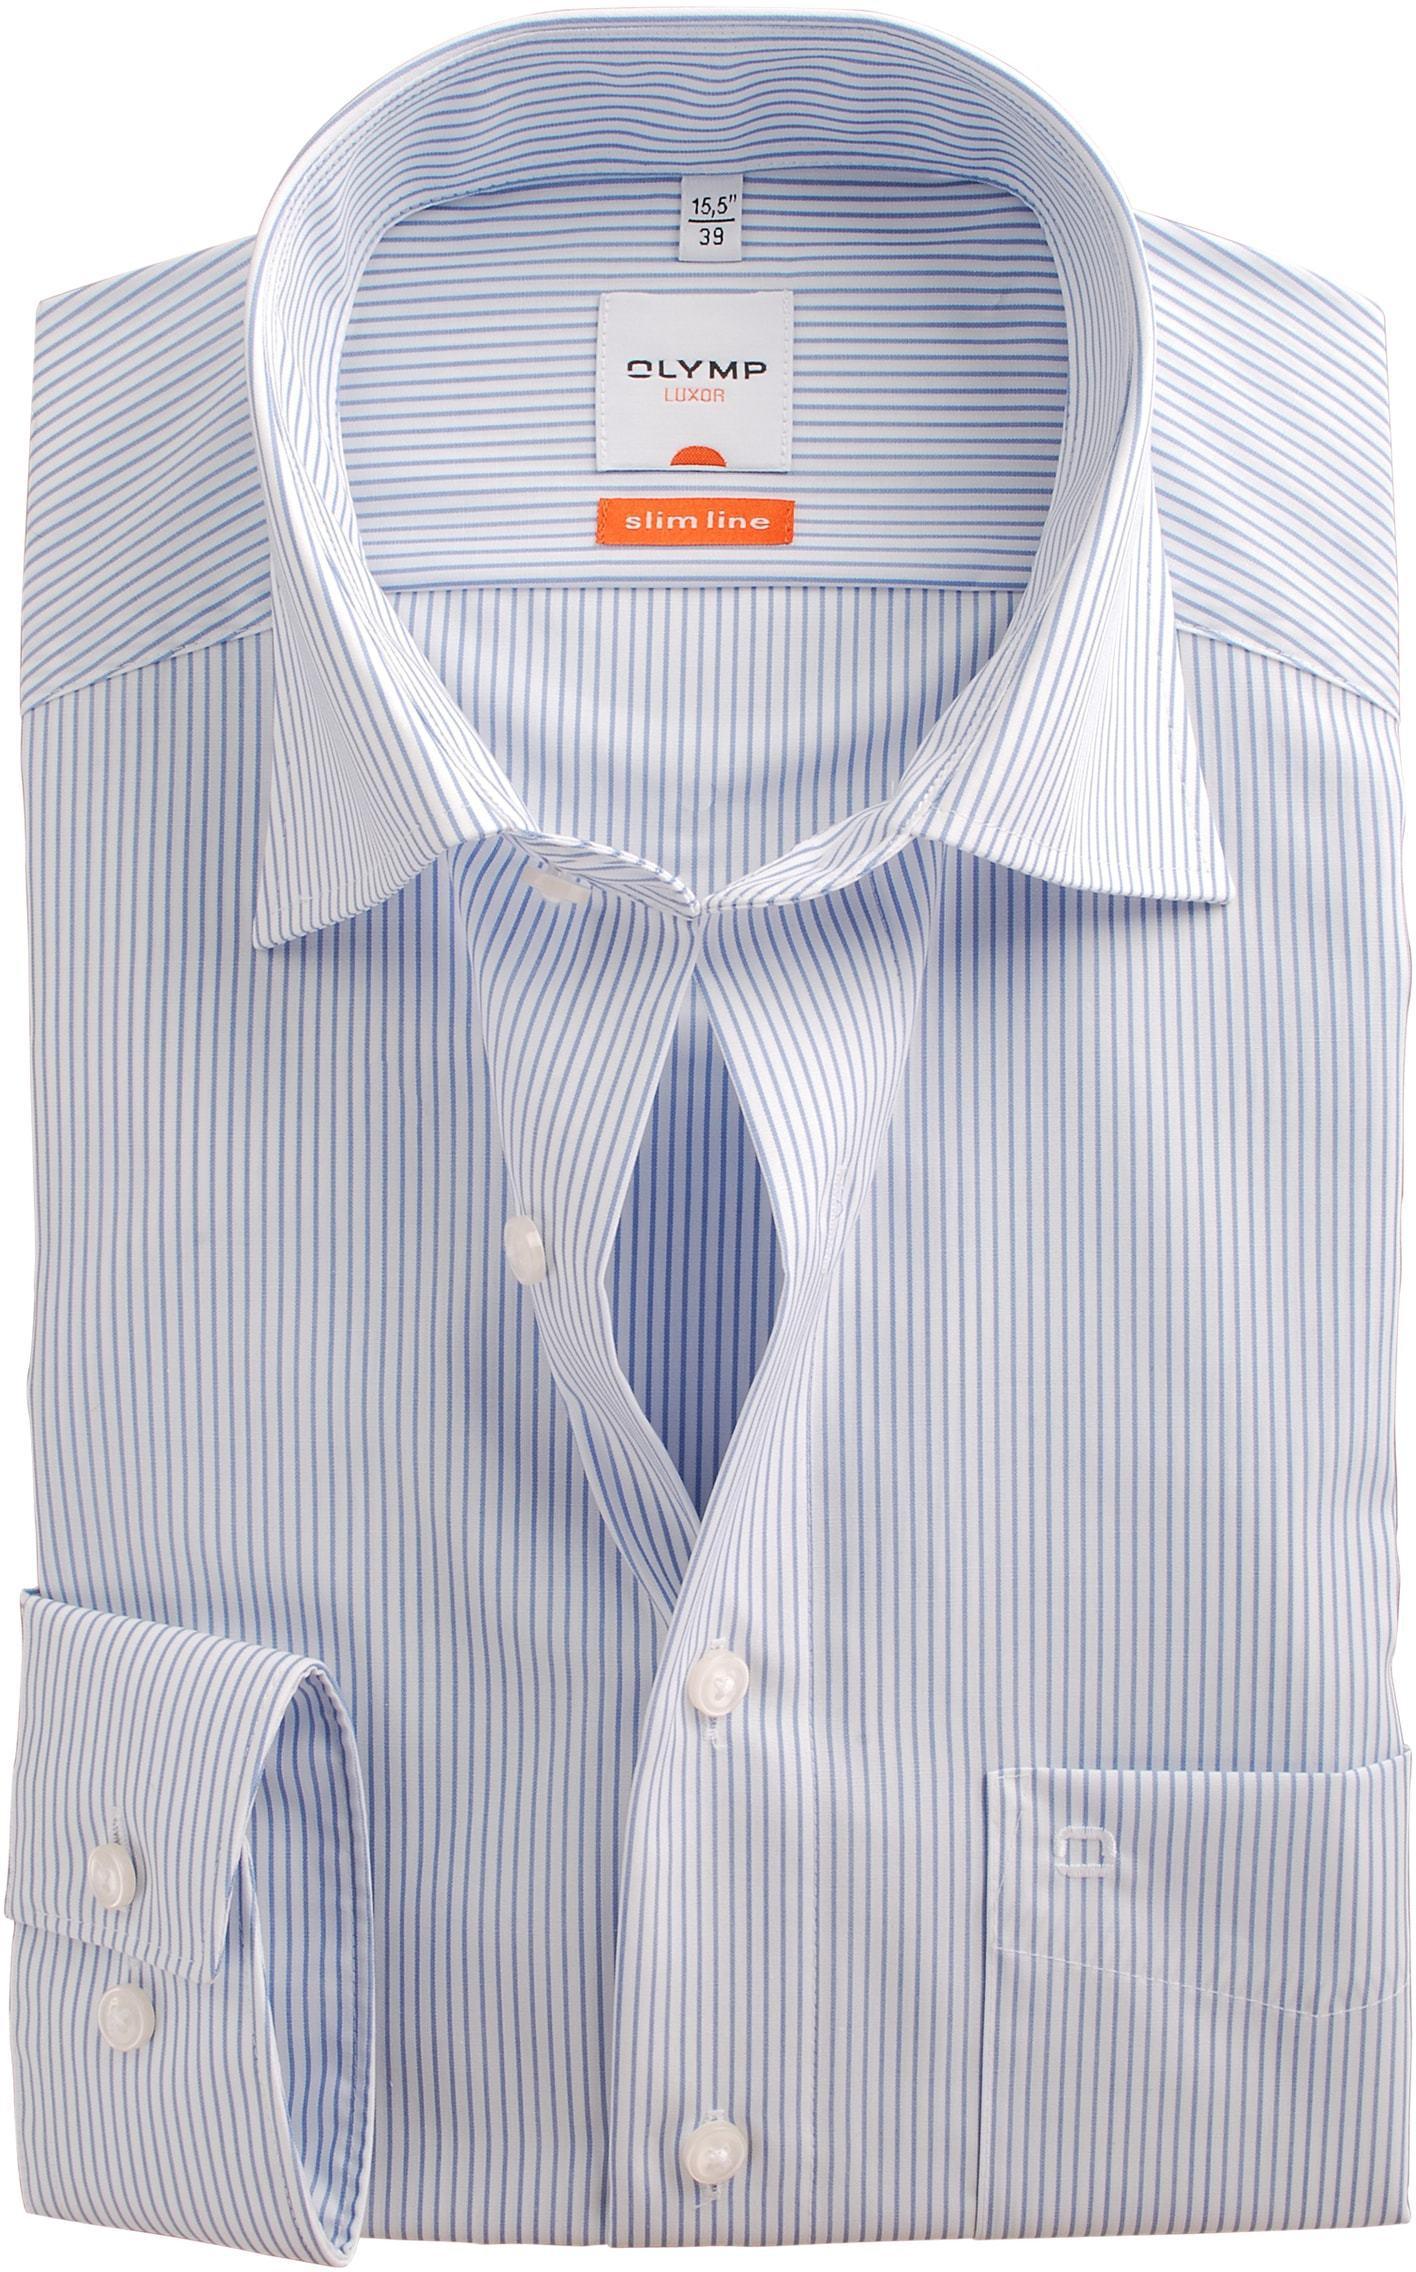 olymp luxor overhemd slim line wit blauw streep. Black Bedroom Furniture Sets. Home Design Ideas